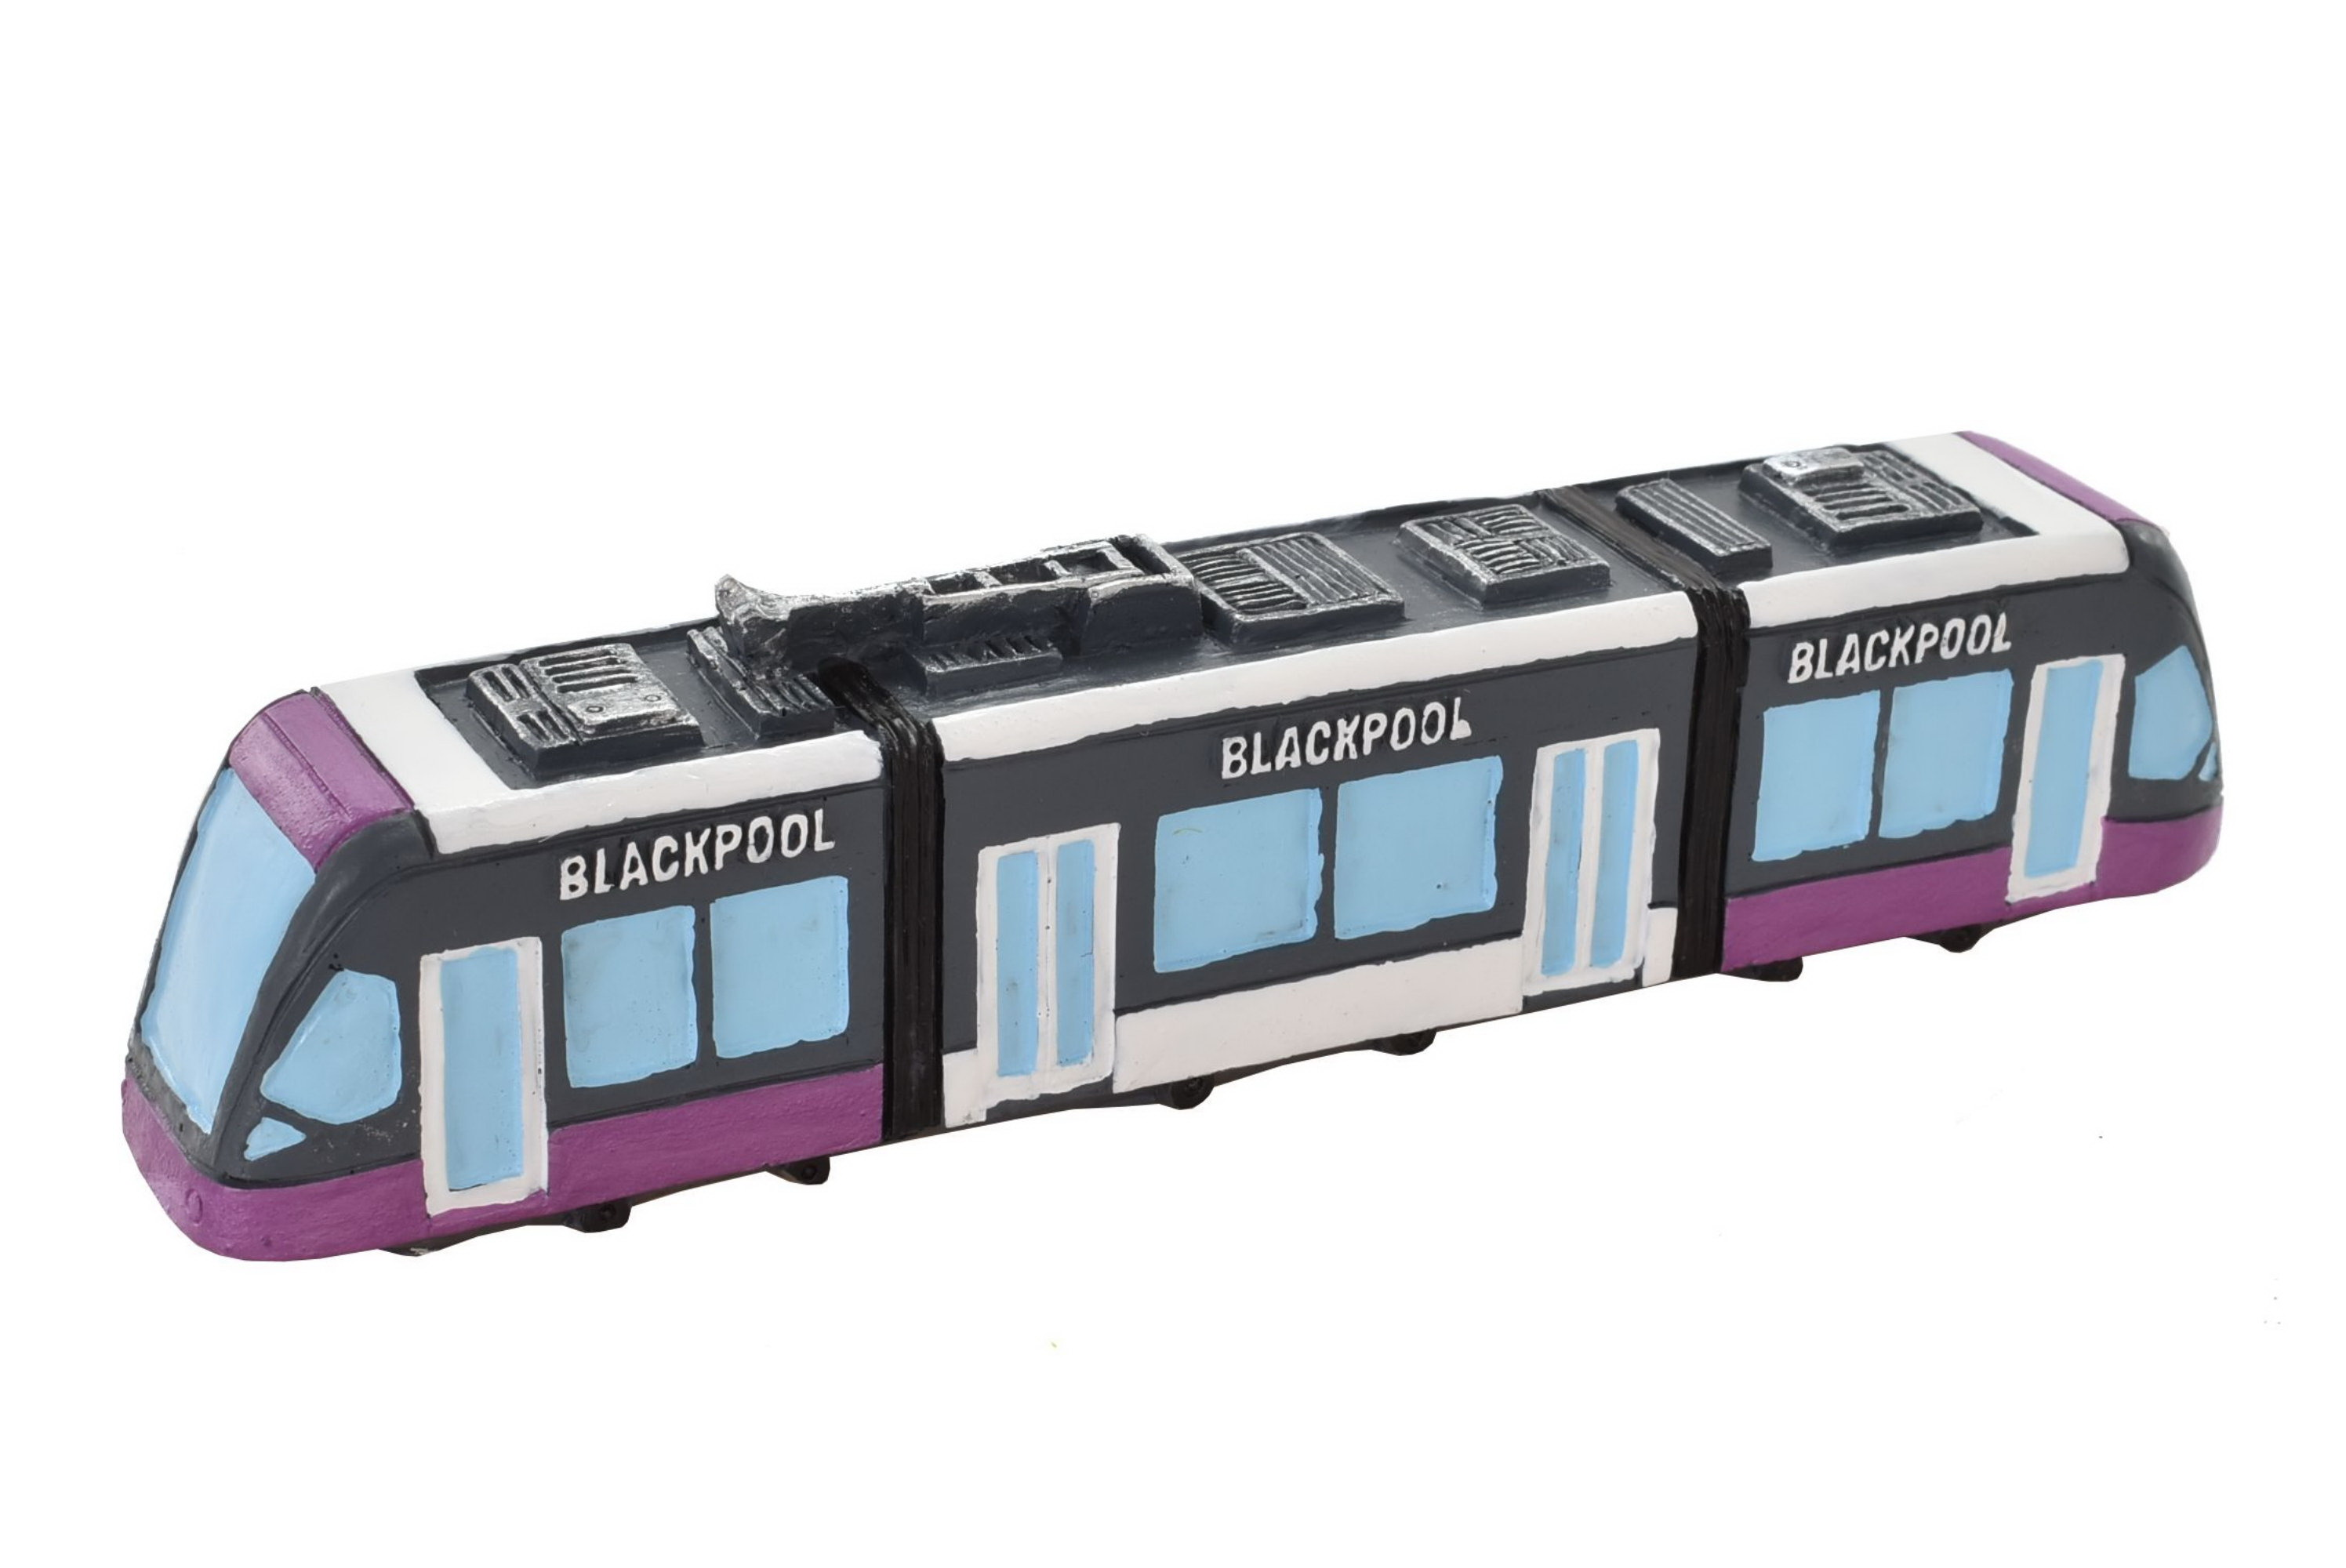 Blackpool Resin Tram New Style 12.5cm